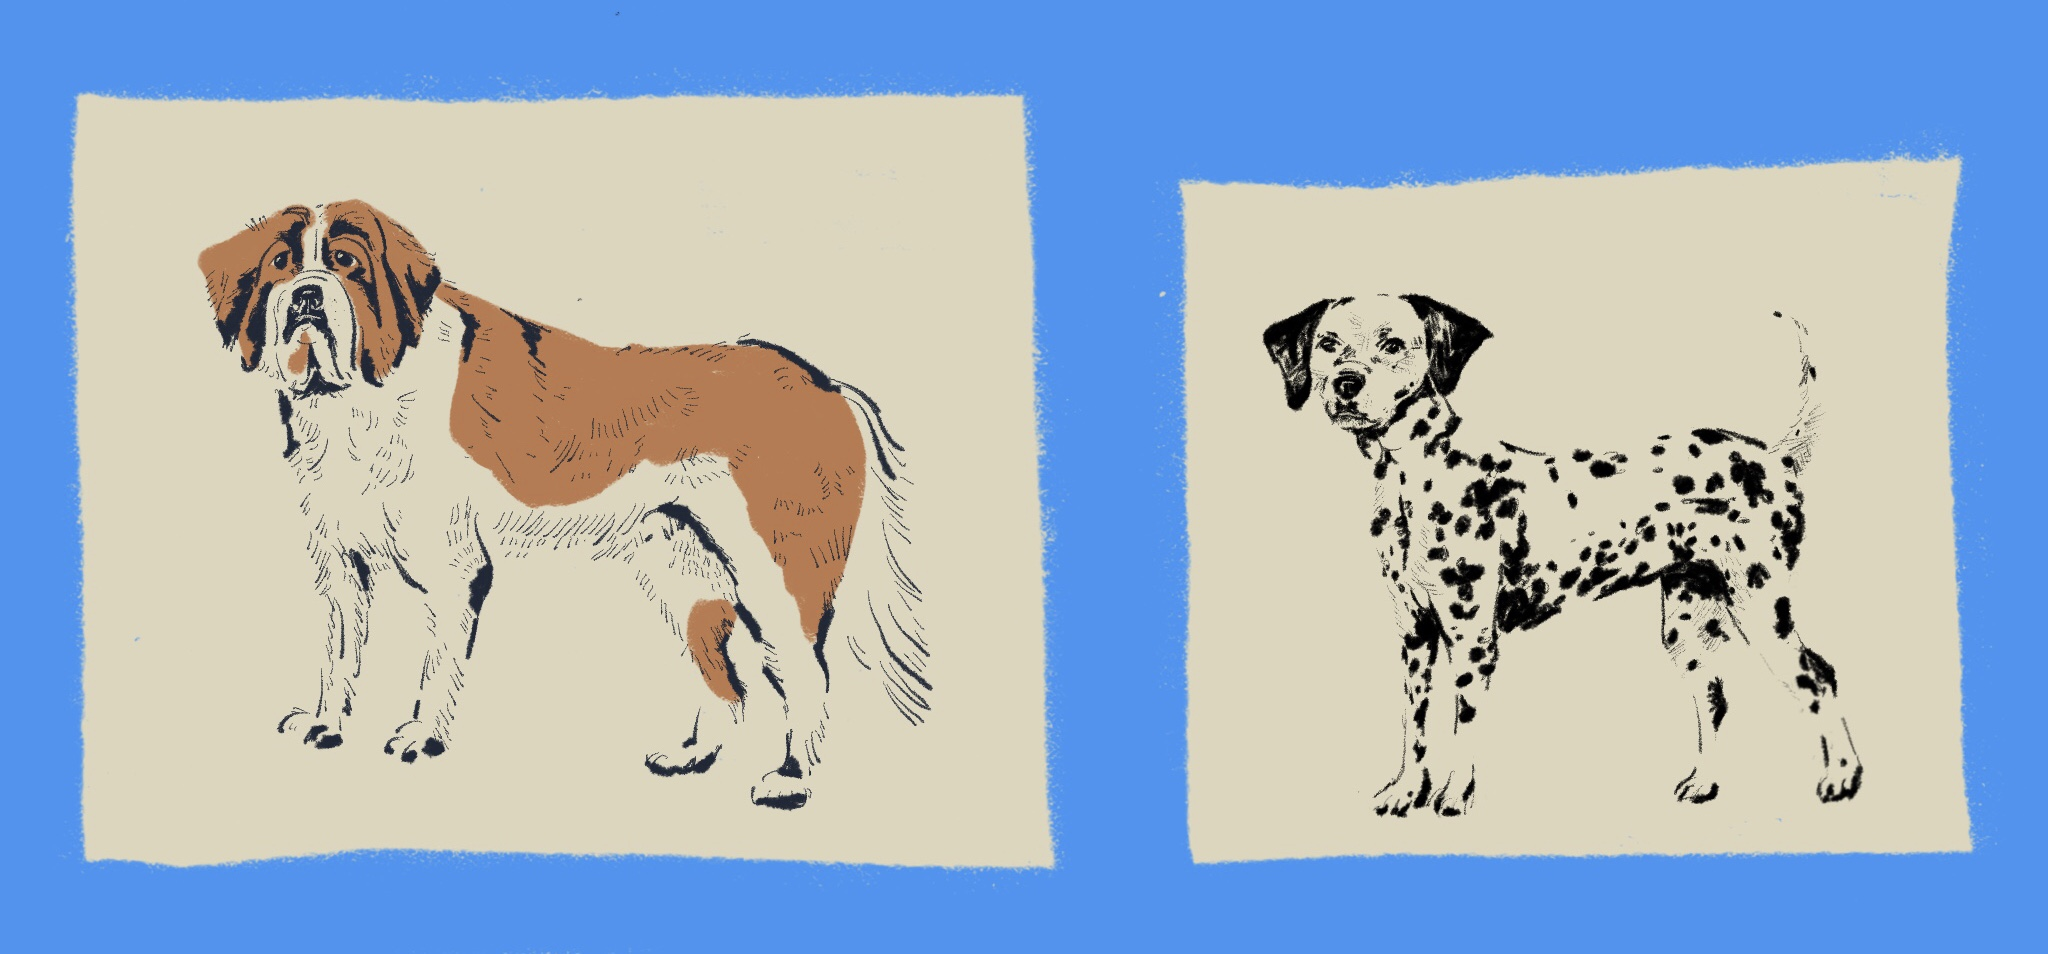 Vintage Dogs Dalmatian_Mallory Cohn.jpg